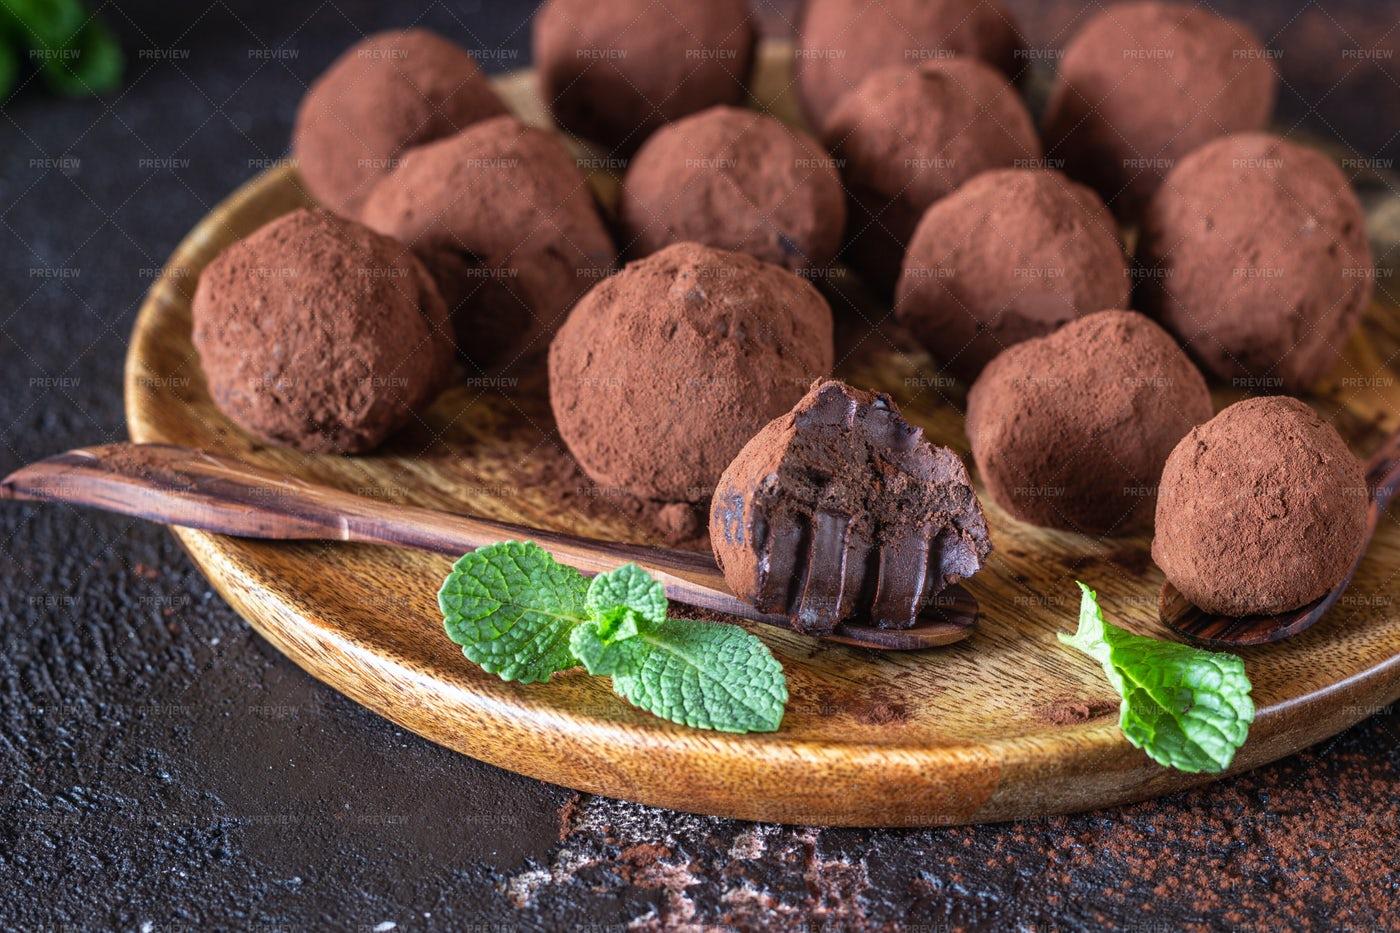 Dark Chocolate Truffles And Mint: Stock Photos